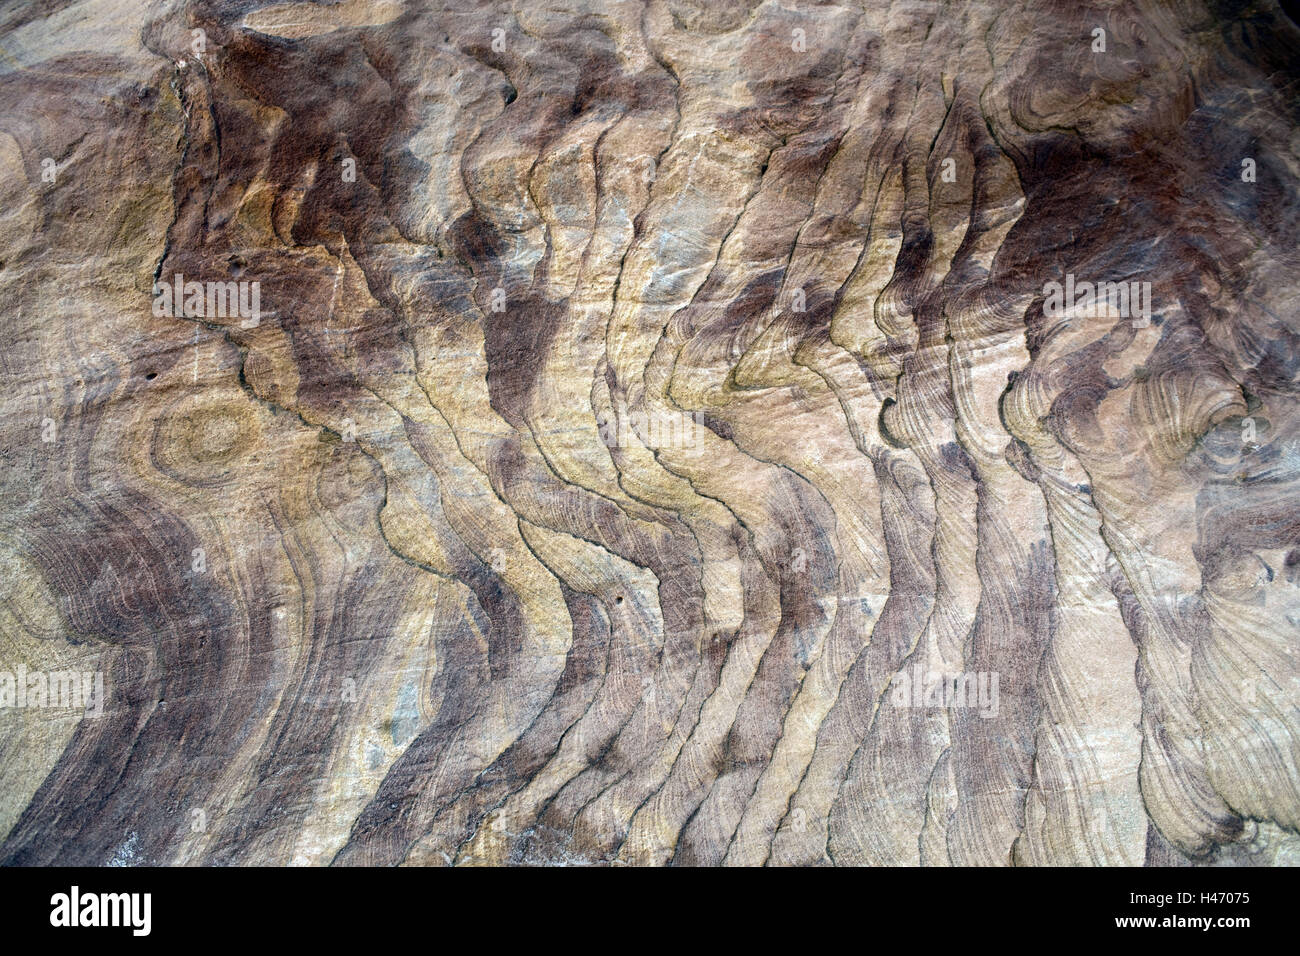 Egypt, Sinai, Nuweiba on the east coast, Coloured canyon, - Stock Image